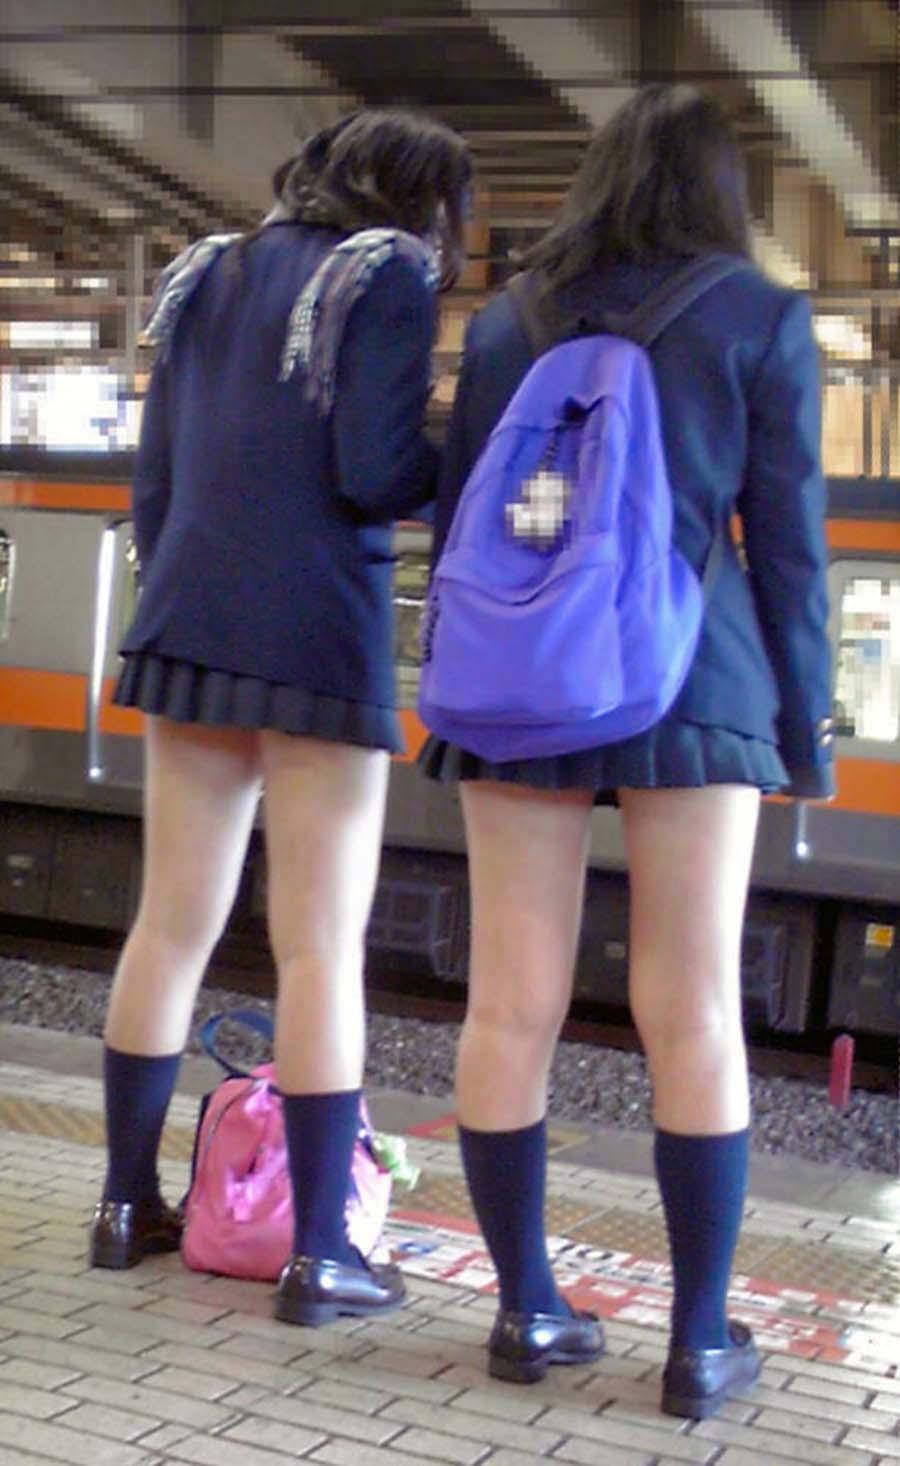 【JK街撮り画像】ゾクゾクするほどそそる女子高生の太もも!スベスベの下半身に思わず勃起しちゃいそうwwww その4